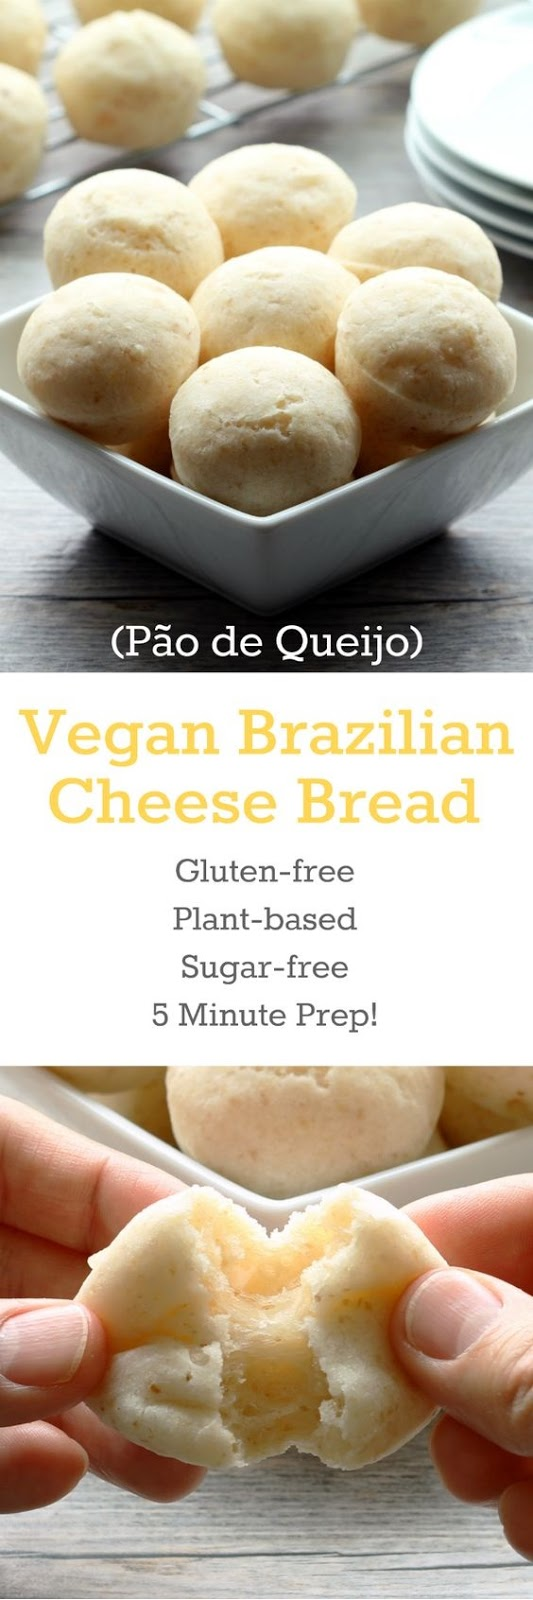 Vegan Brazilian Cheese Bread